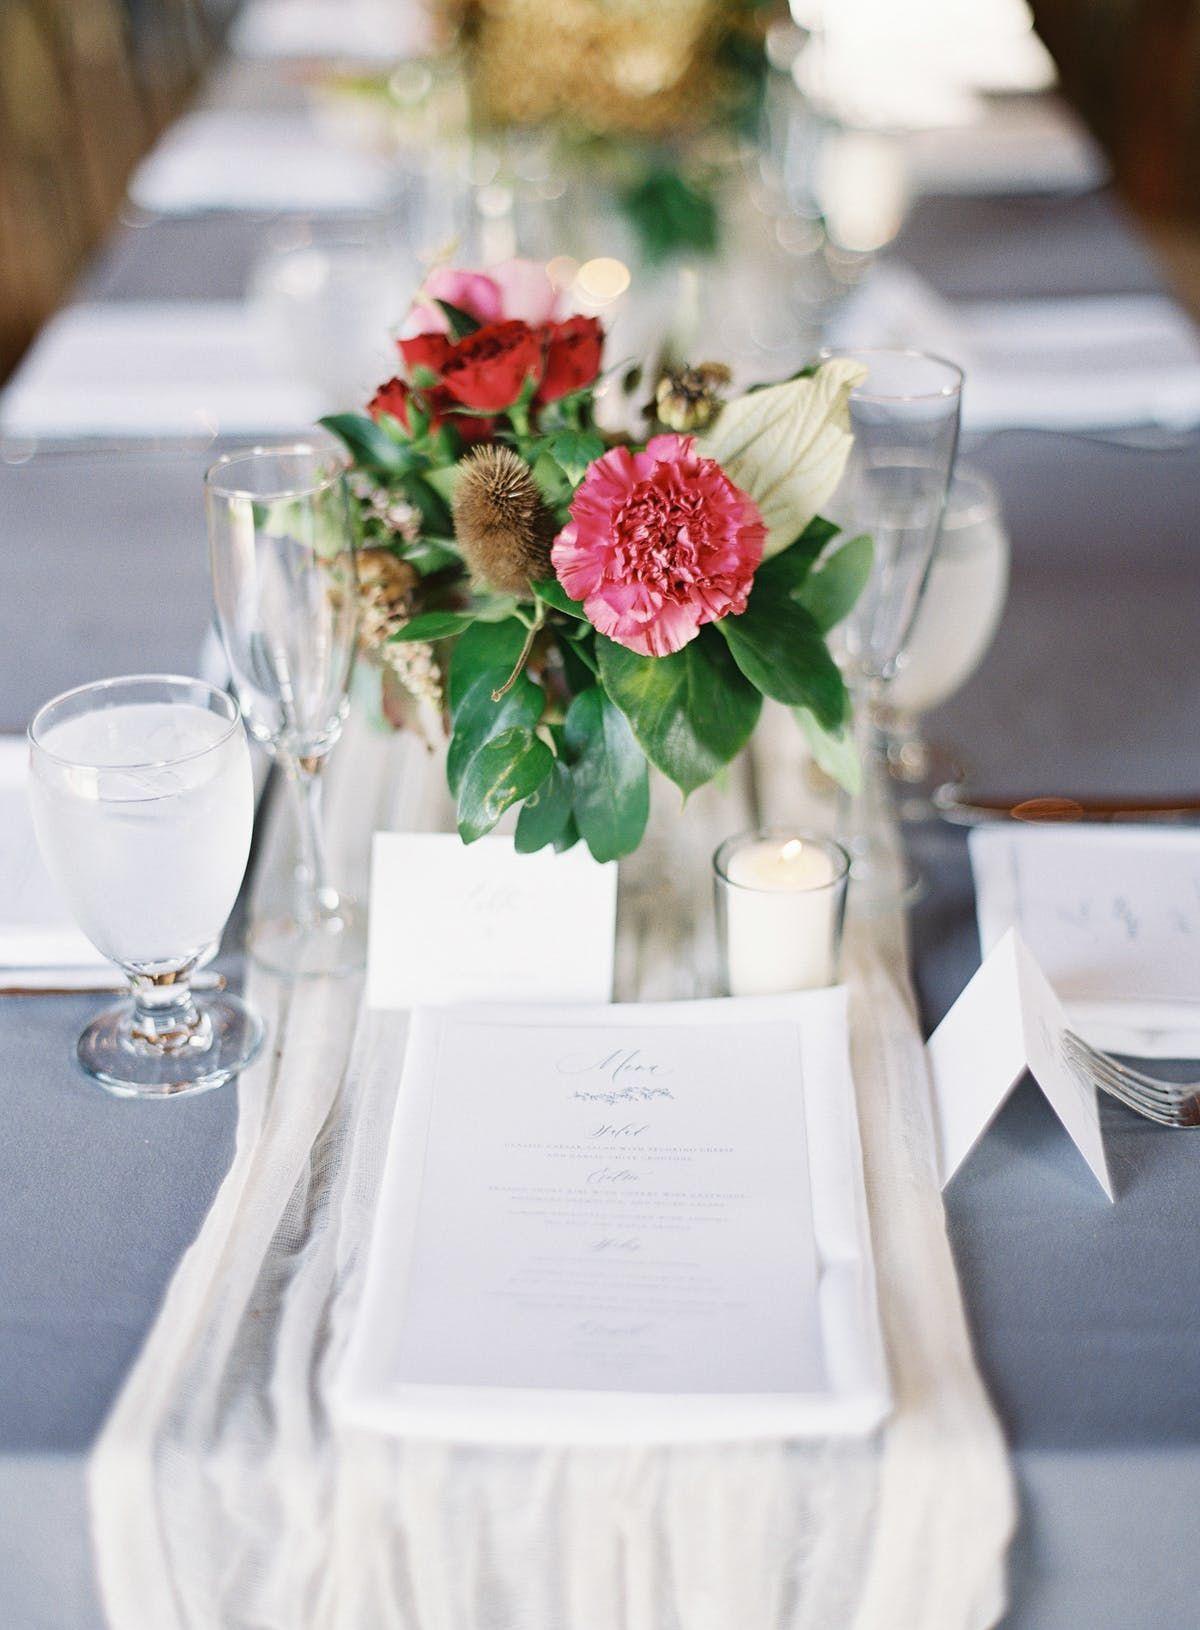 #Weddingtable #Centerpiece #Tablerunner #Rusticelegance Photographer Esther Sun Photography - Event